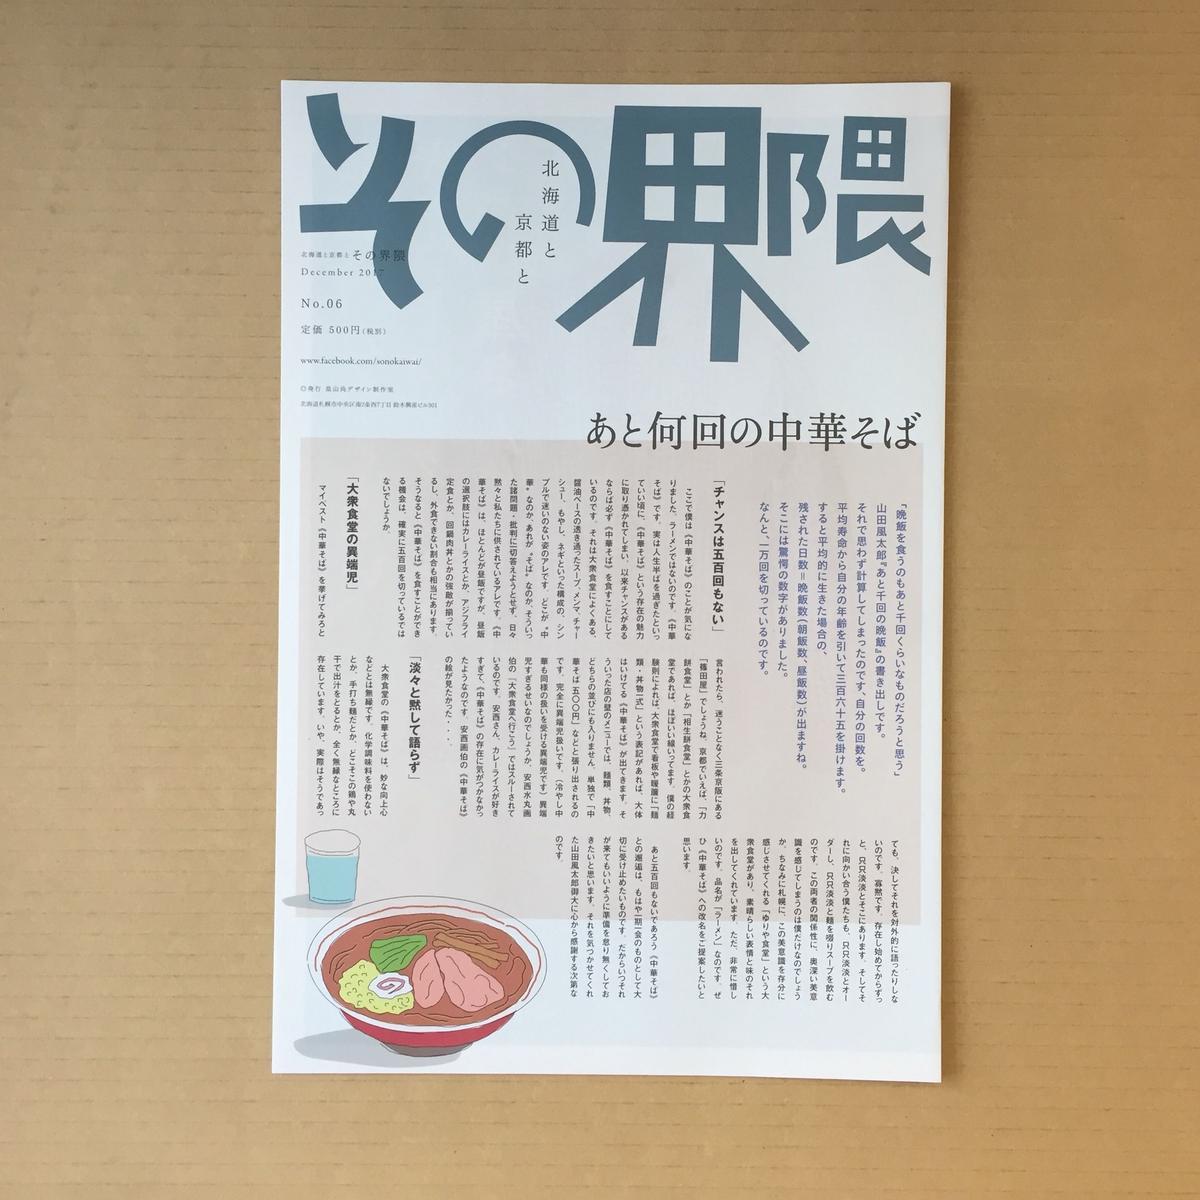 ng-non-bindable>北海道と京都と その界隈  第6号 | HH DESIGN